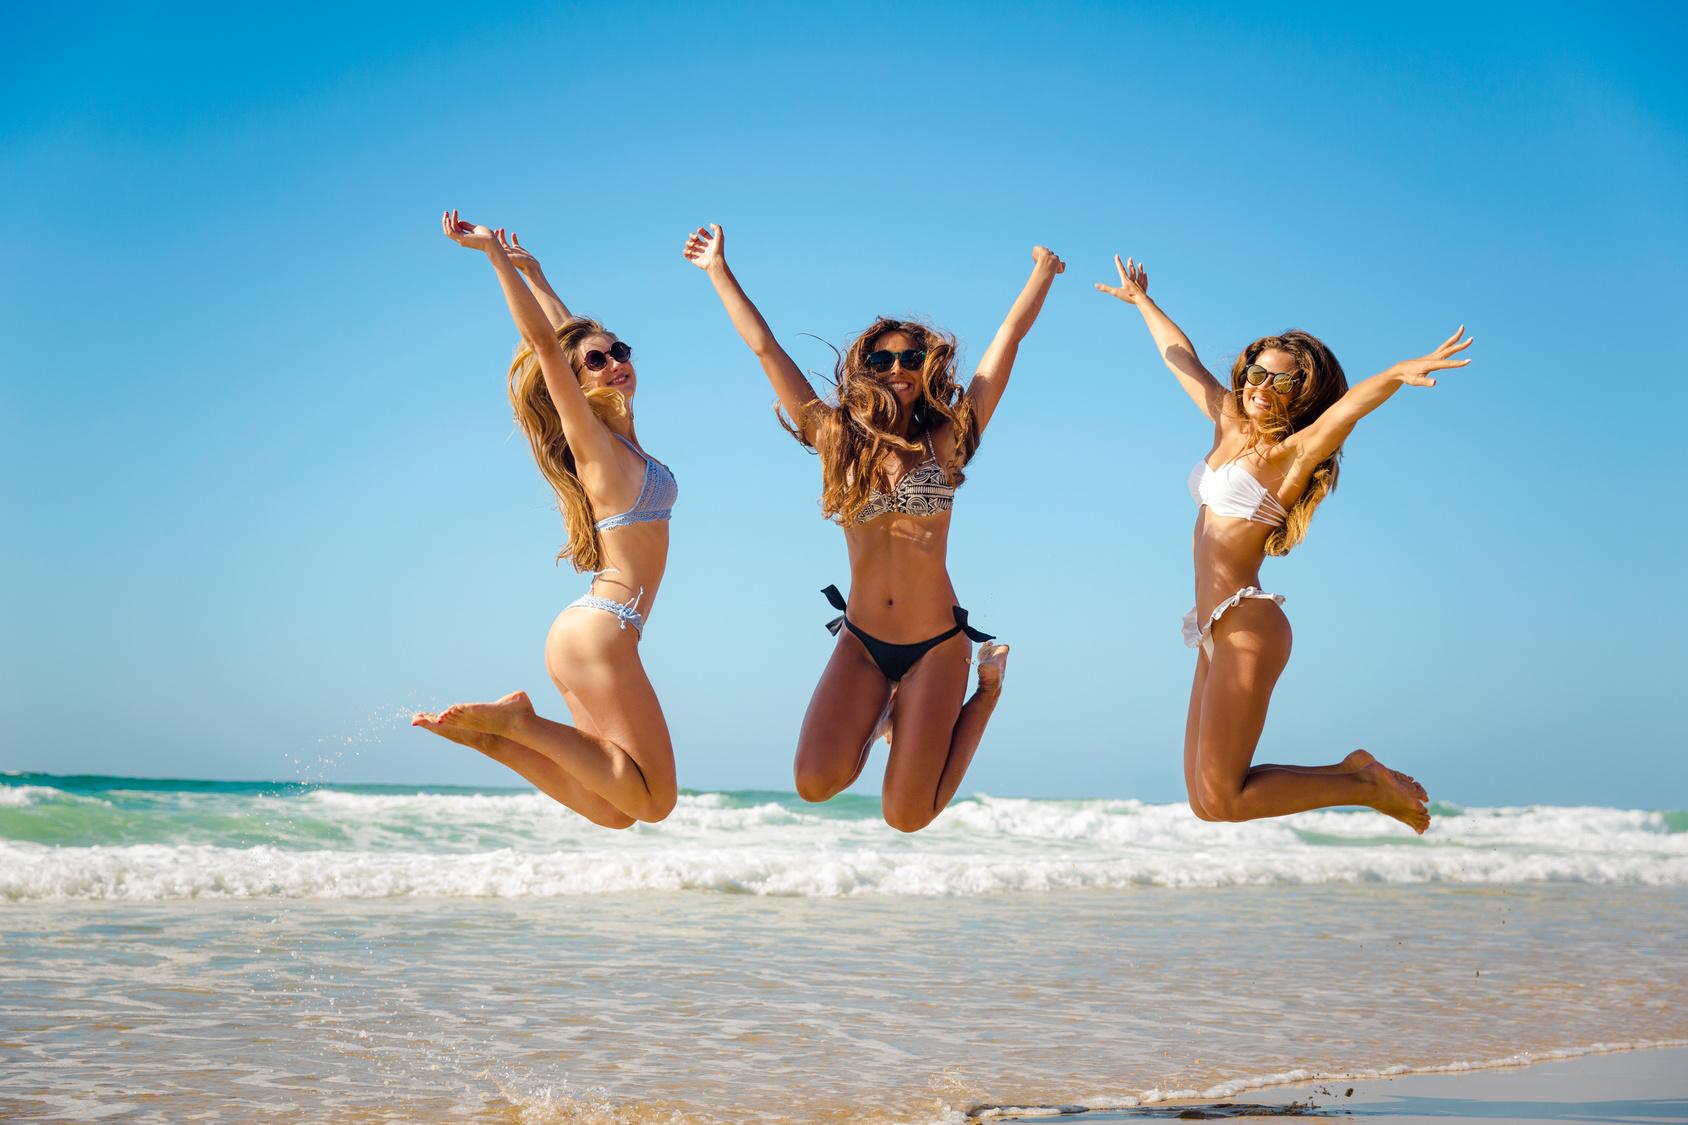 Three girls jumping on the beach